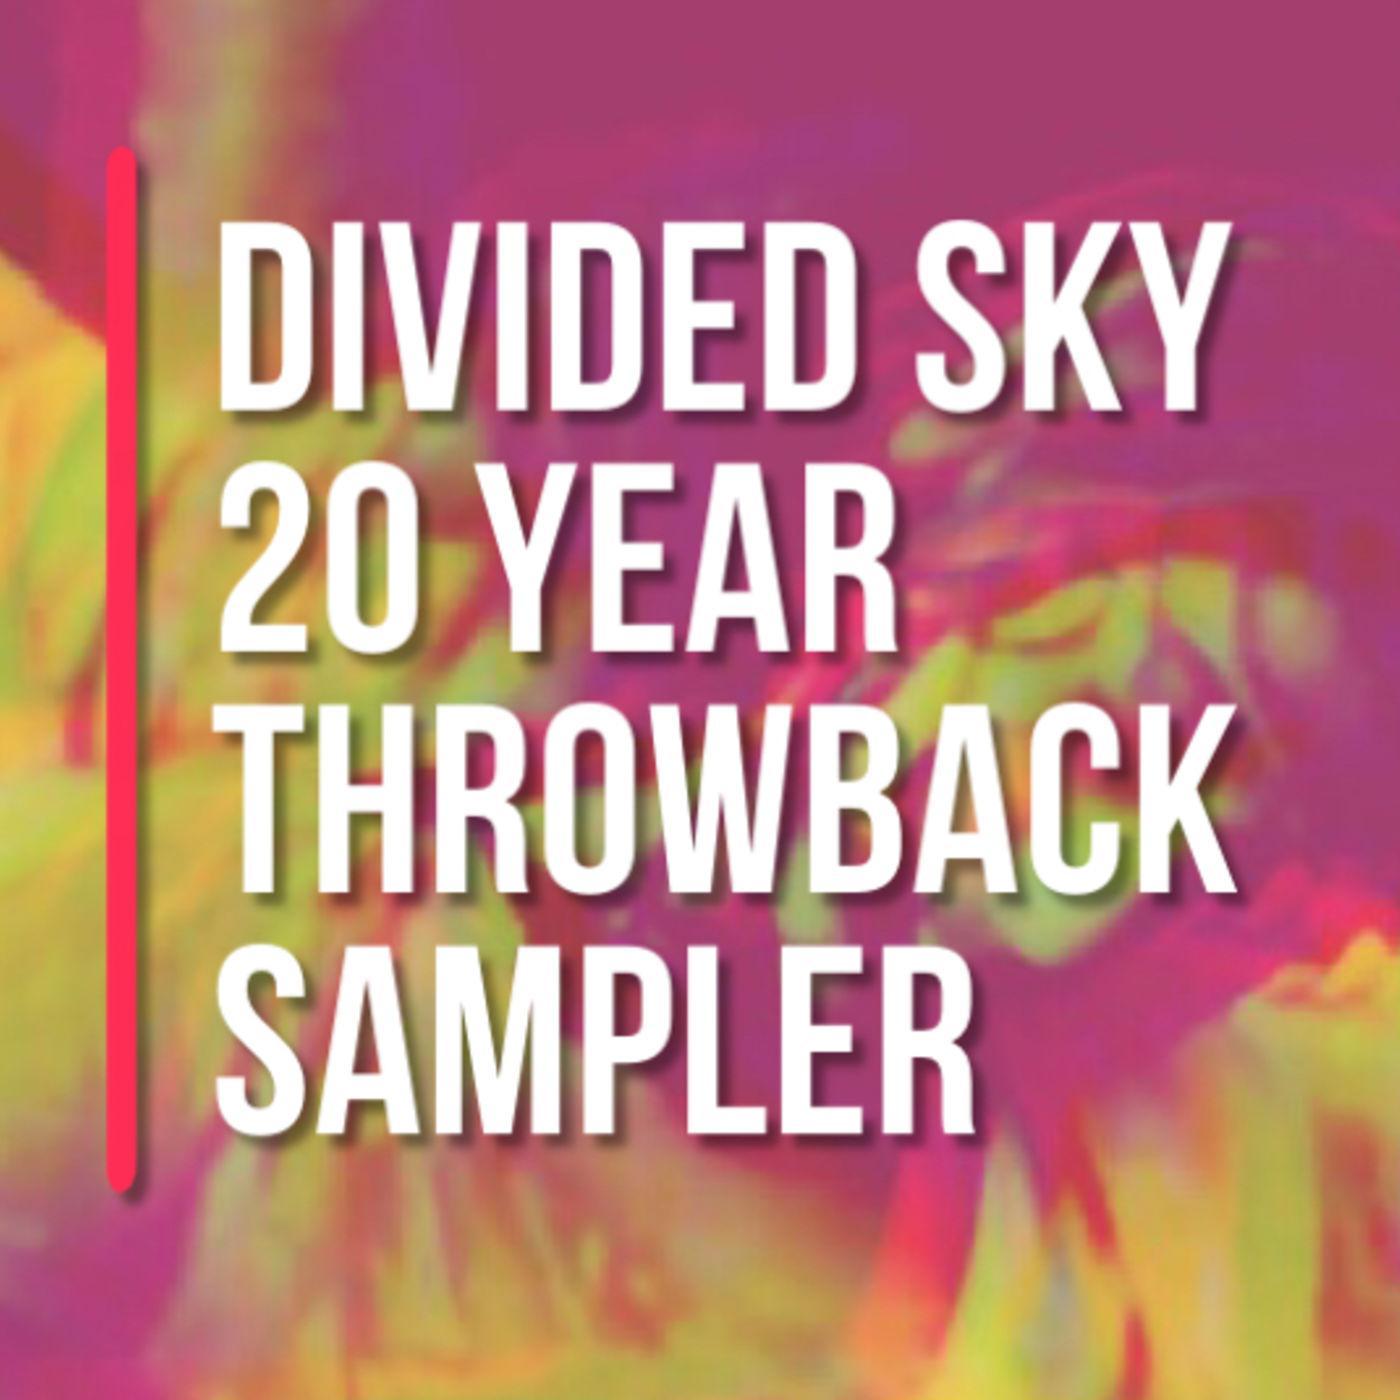 Divided Sky 20 Year Throwback Sampler